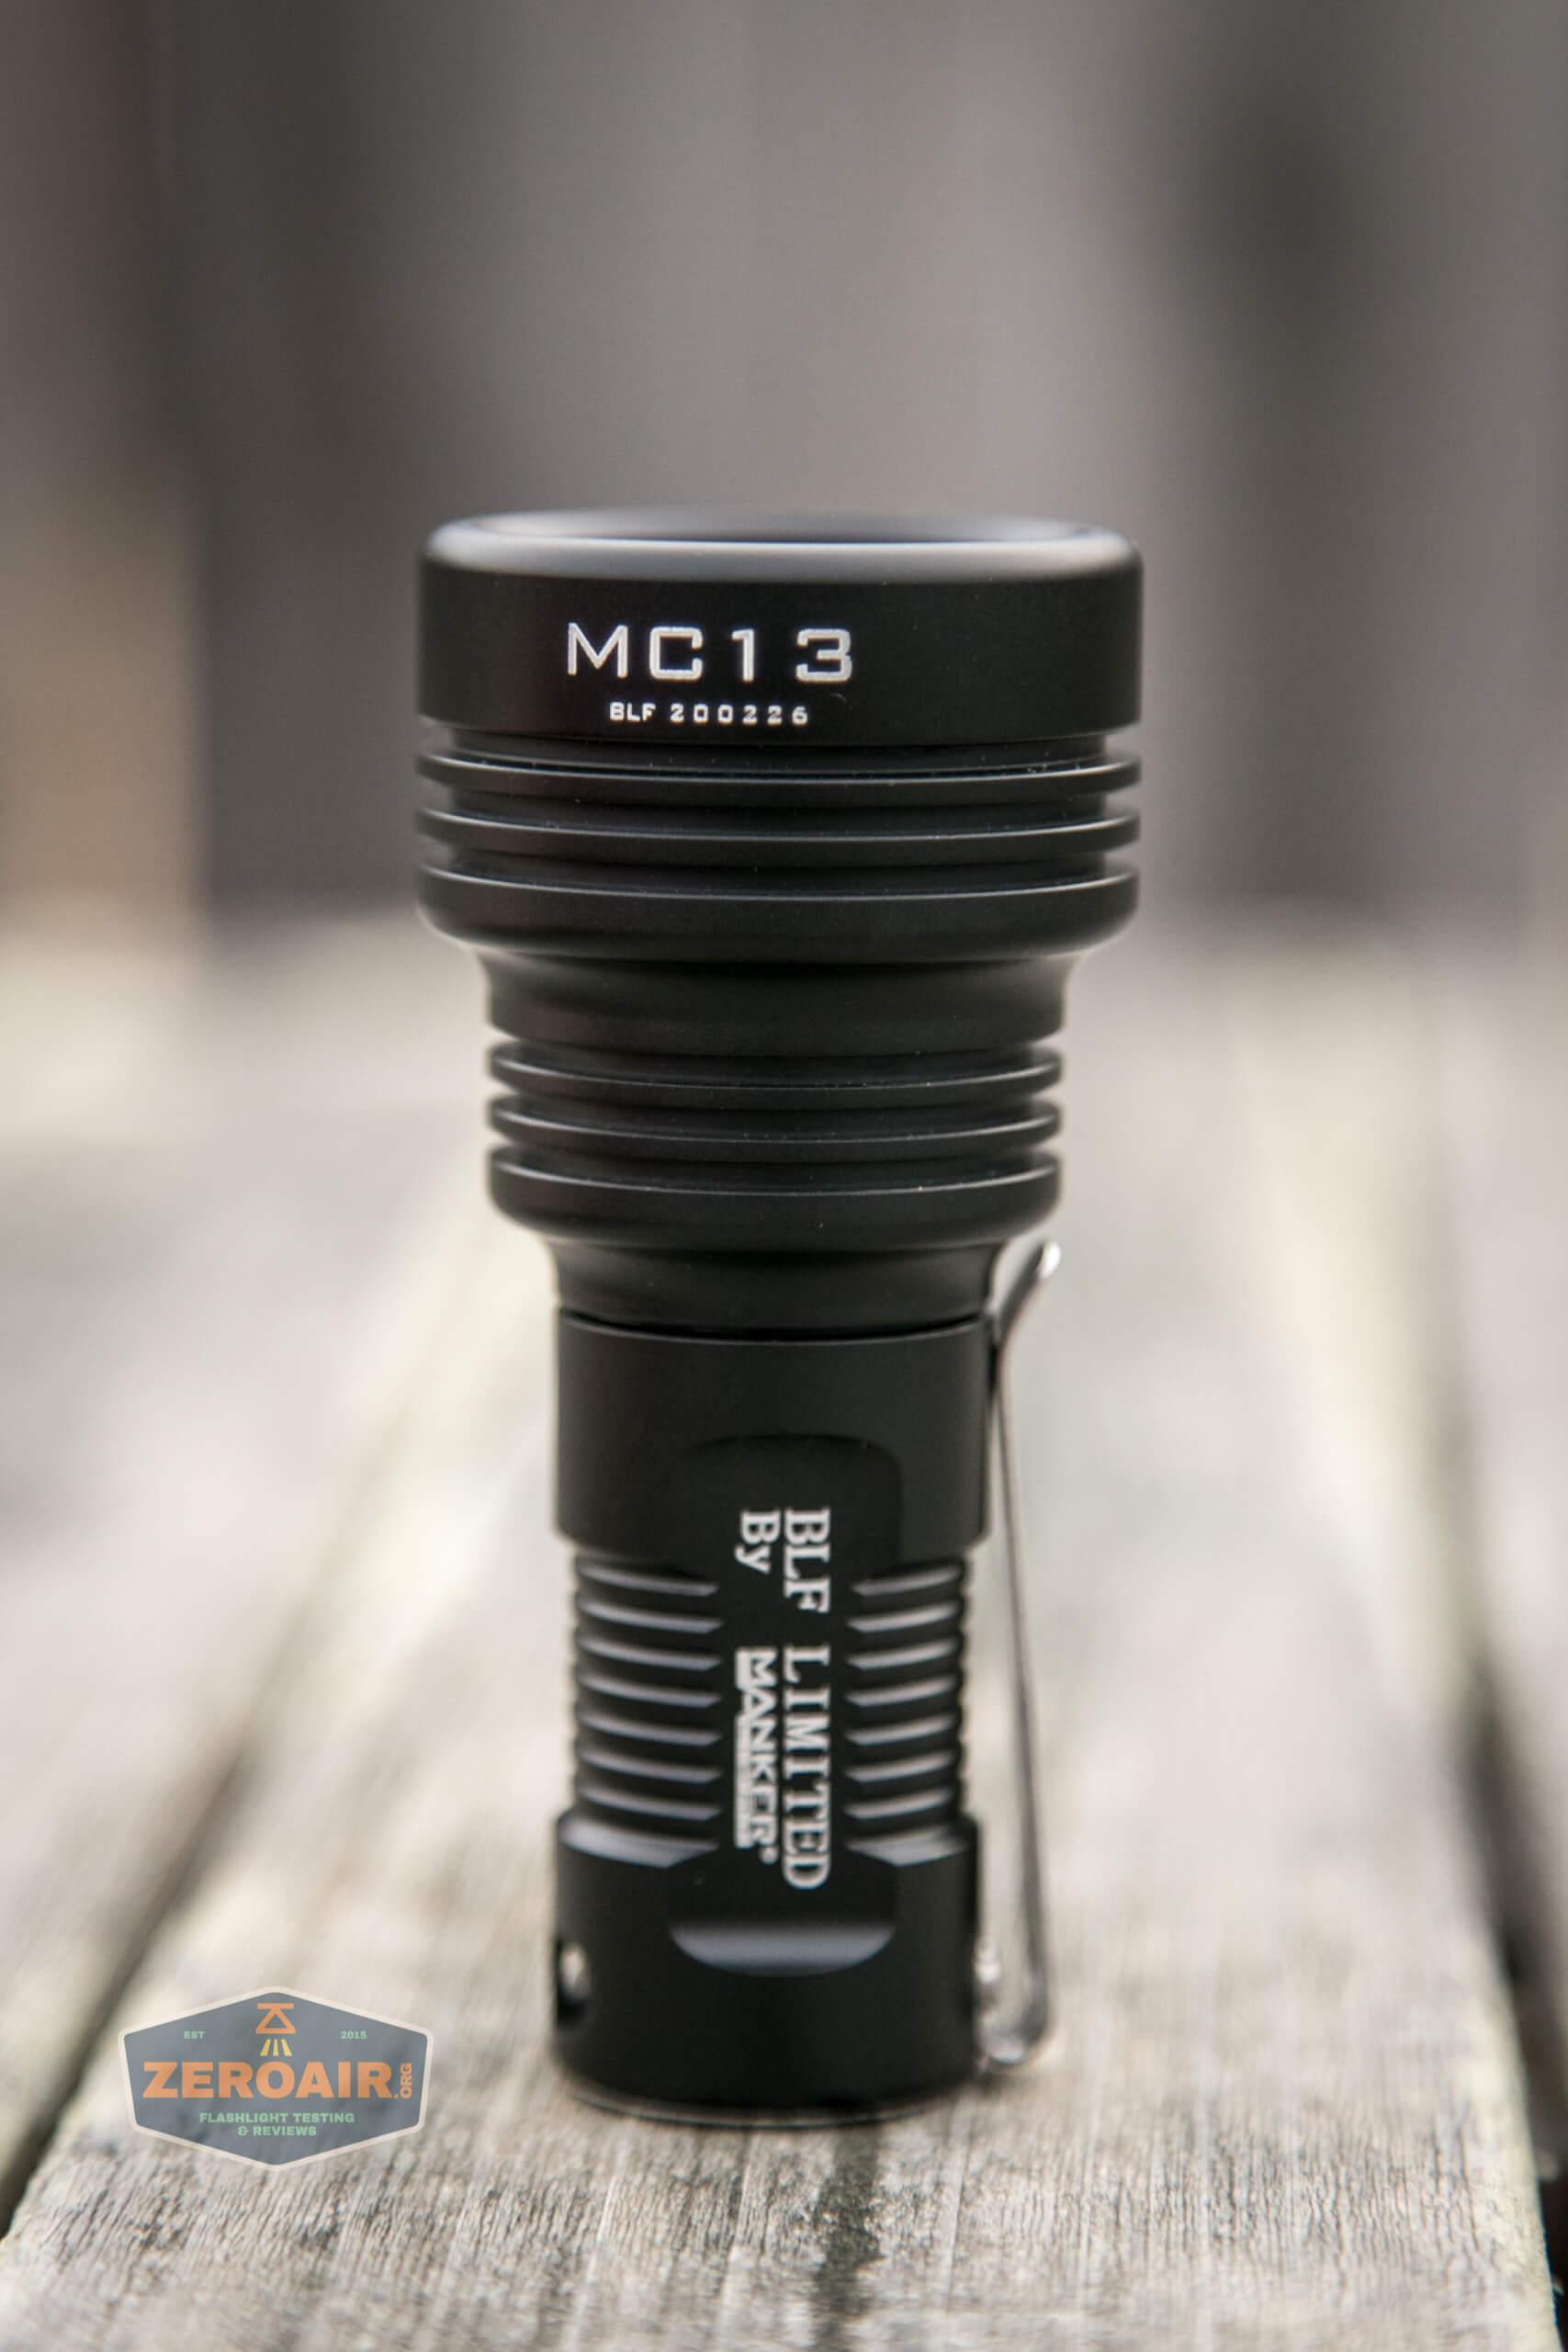 Manker MC13 thrower flashlight 18350 man four photos